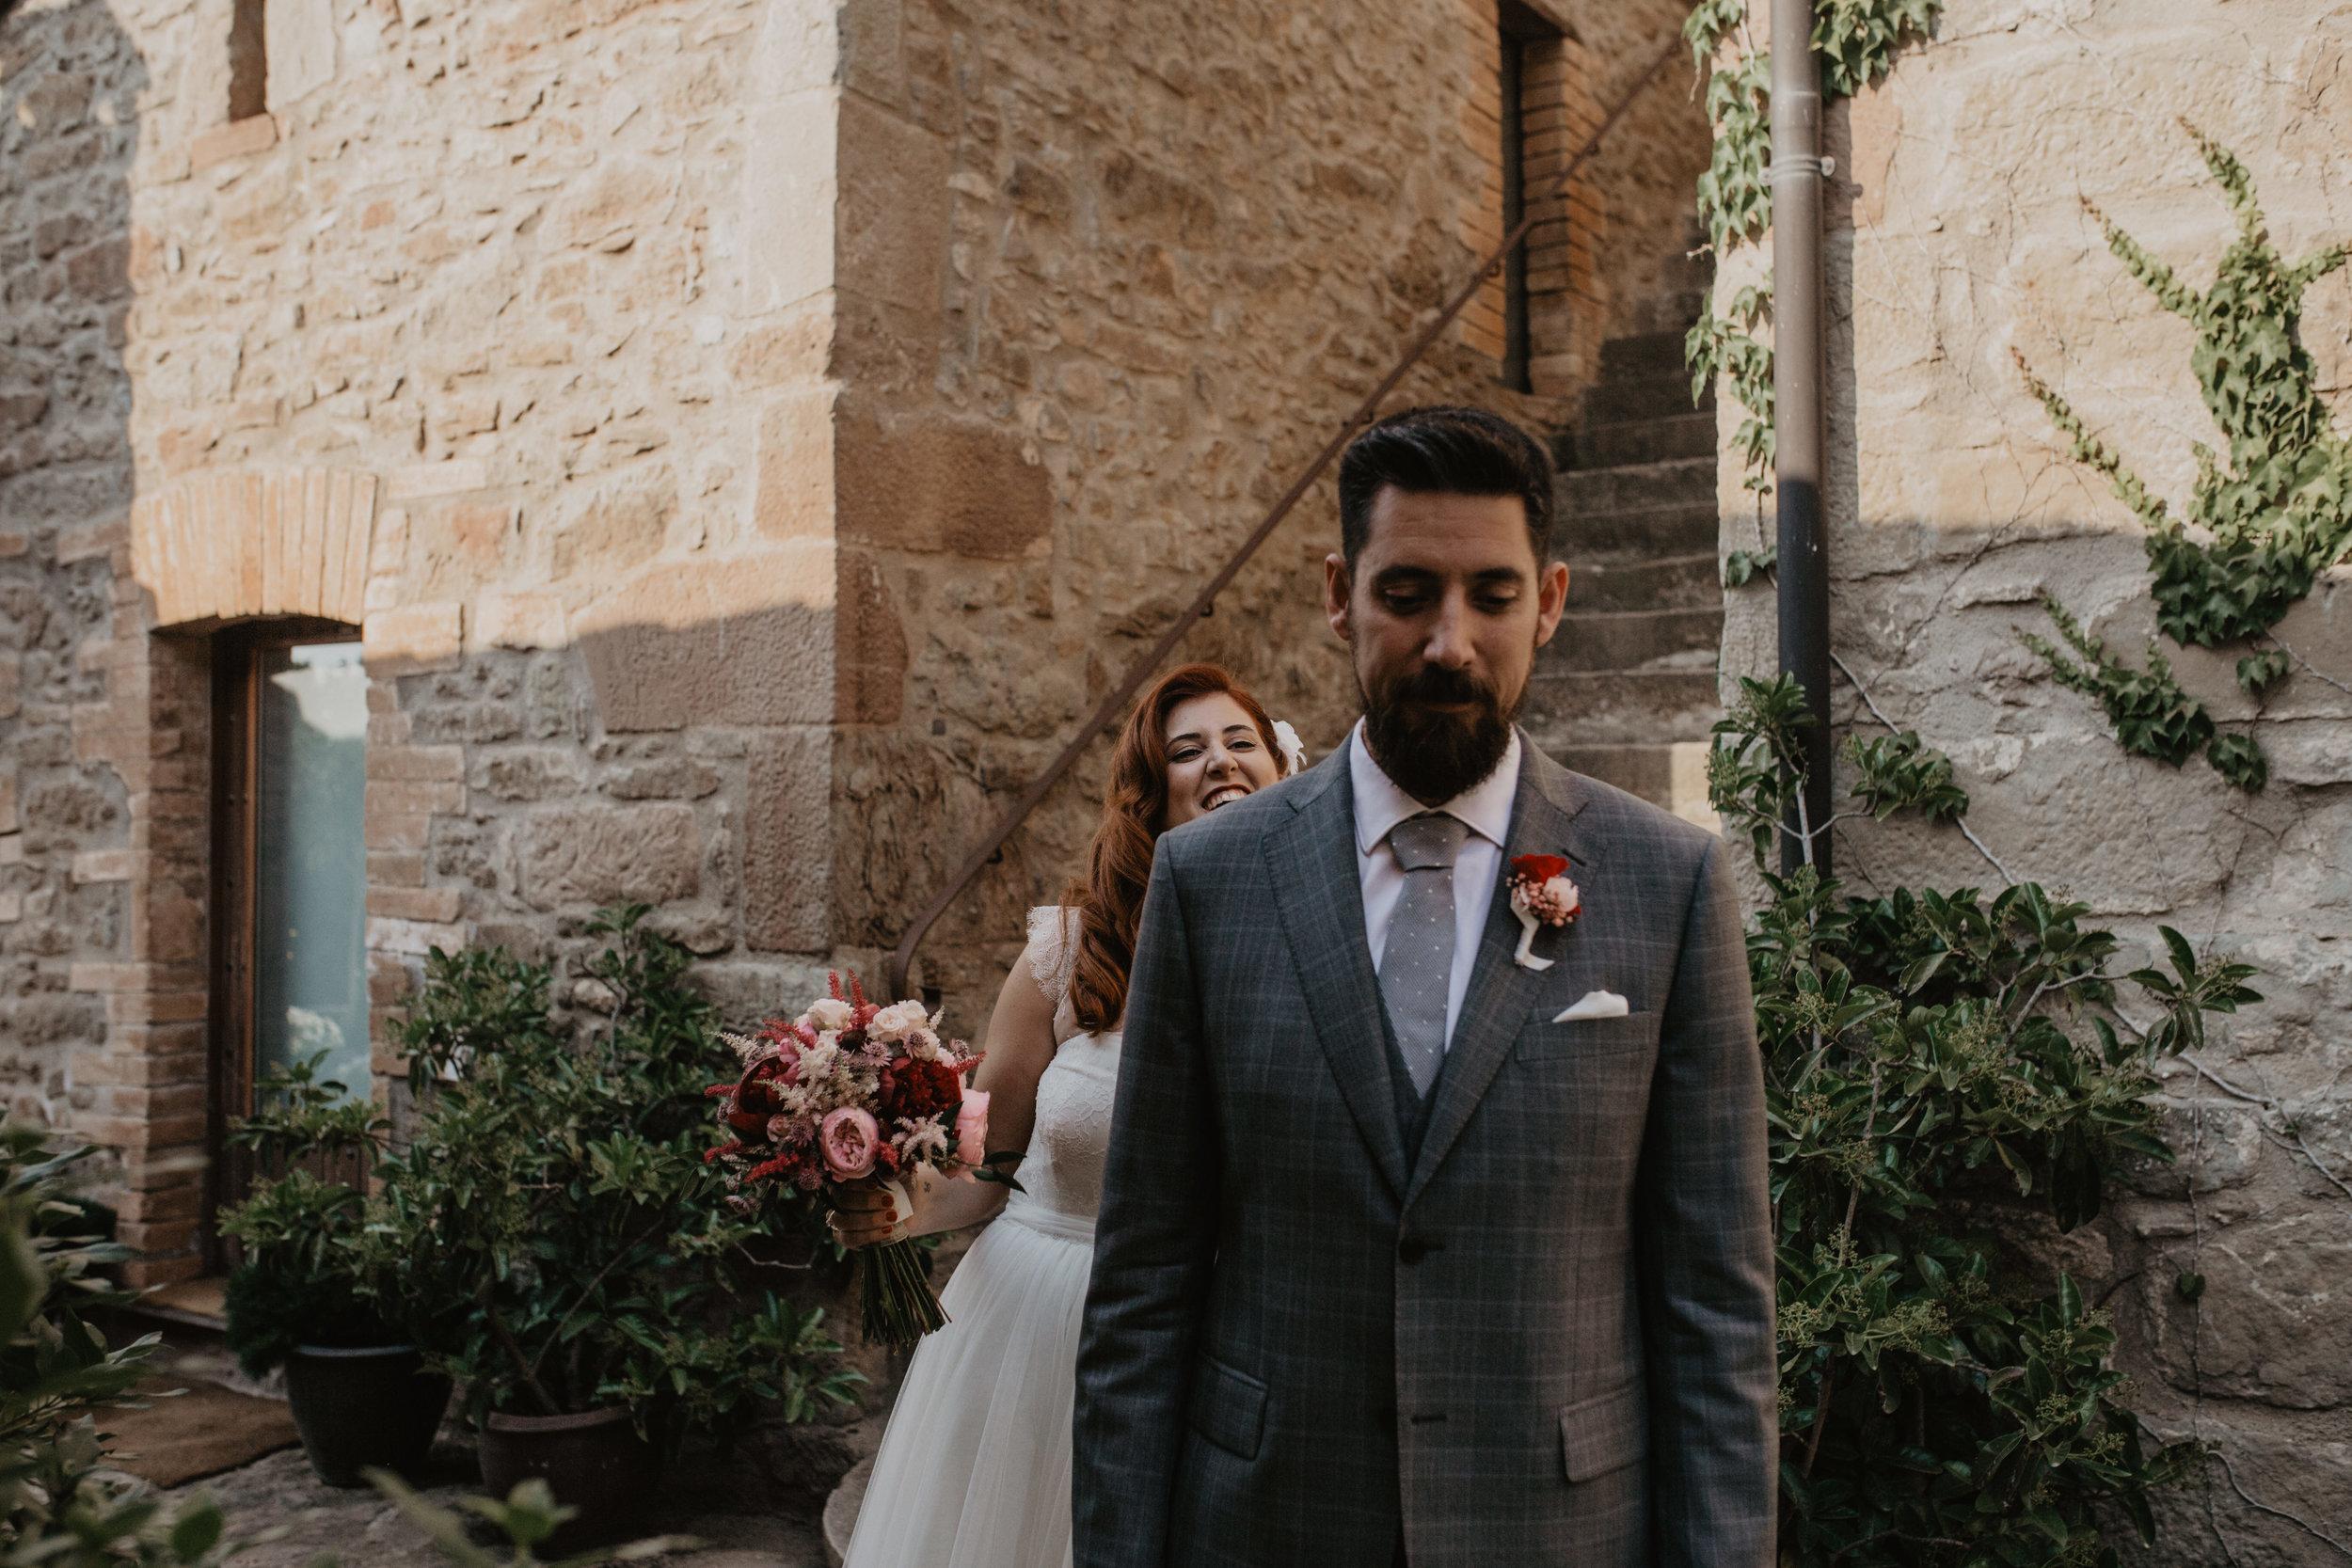 thenortherngirlphotography_photography_thenortherngirl_rebeccascabros_wedding_weddingphotography_masialagarrigadecastelladral_joaniemma_bodaenbarcelona_weddingphotographer_emmaijoan-235.jpg